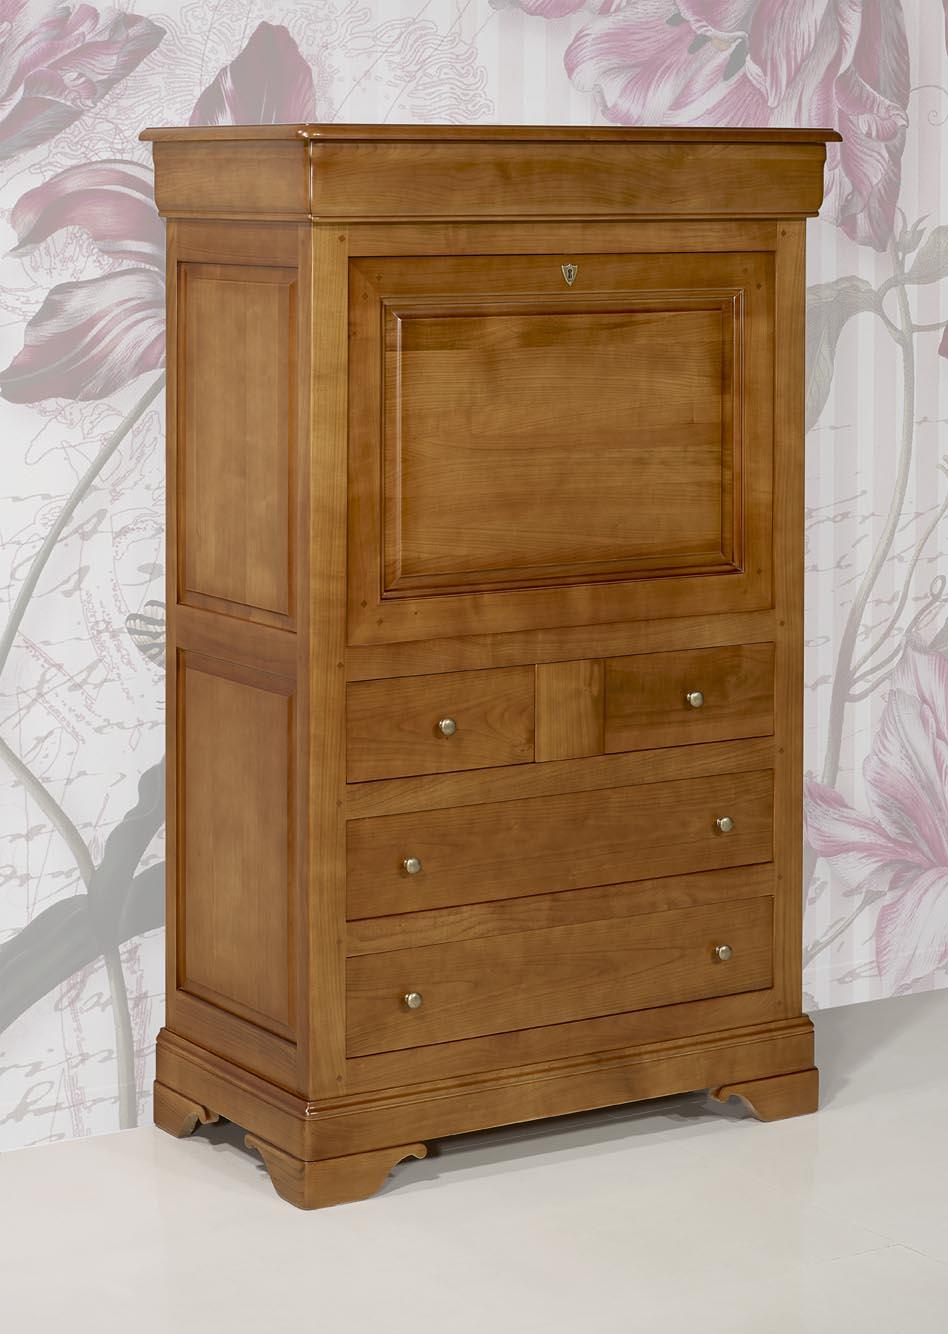 secr taire en merisier massif de style louis philippe meuble en merisier. Black Bedroom Furniture Sets. Home Design Ideas